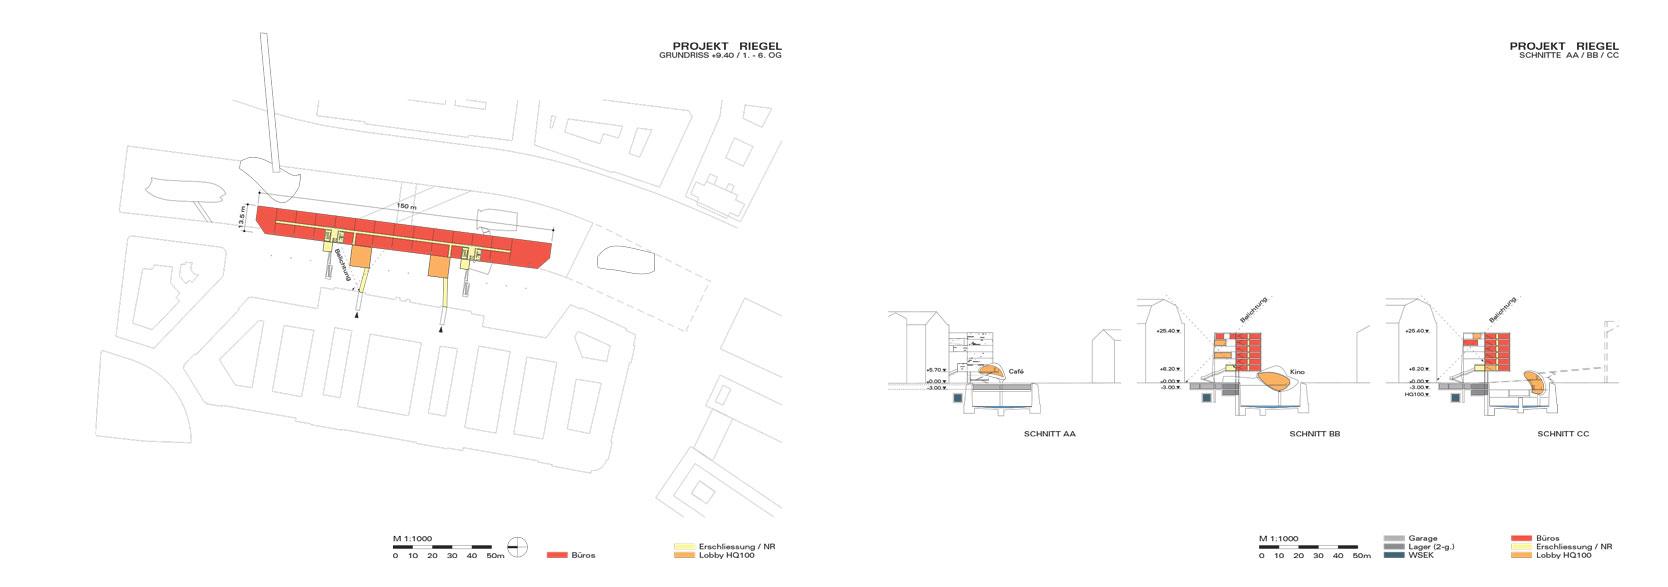 Wienfluss Architektur: Plan/Sections Five-storey structure